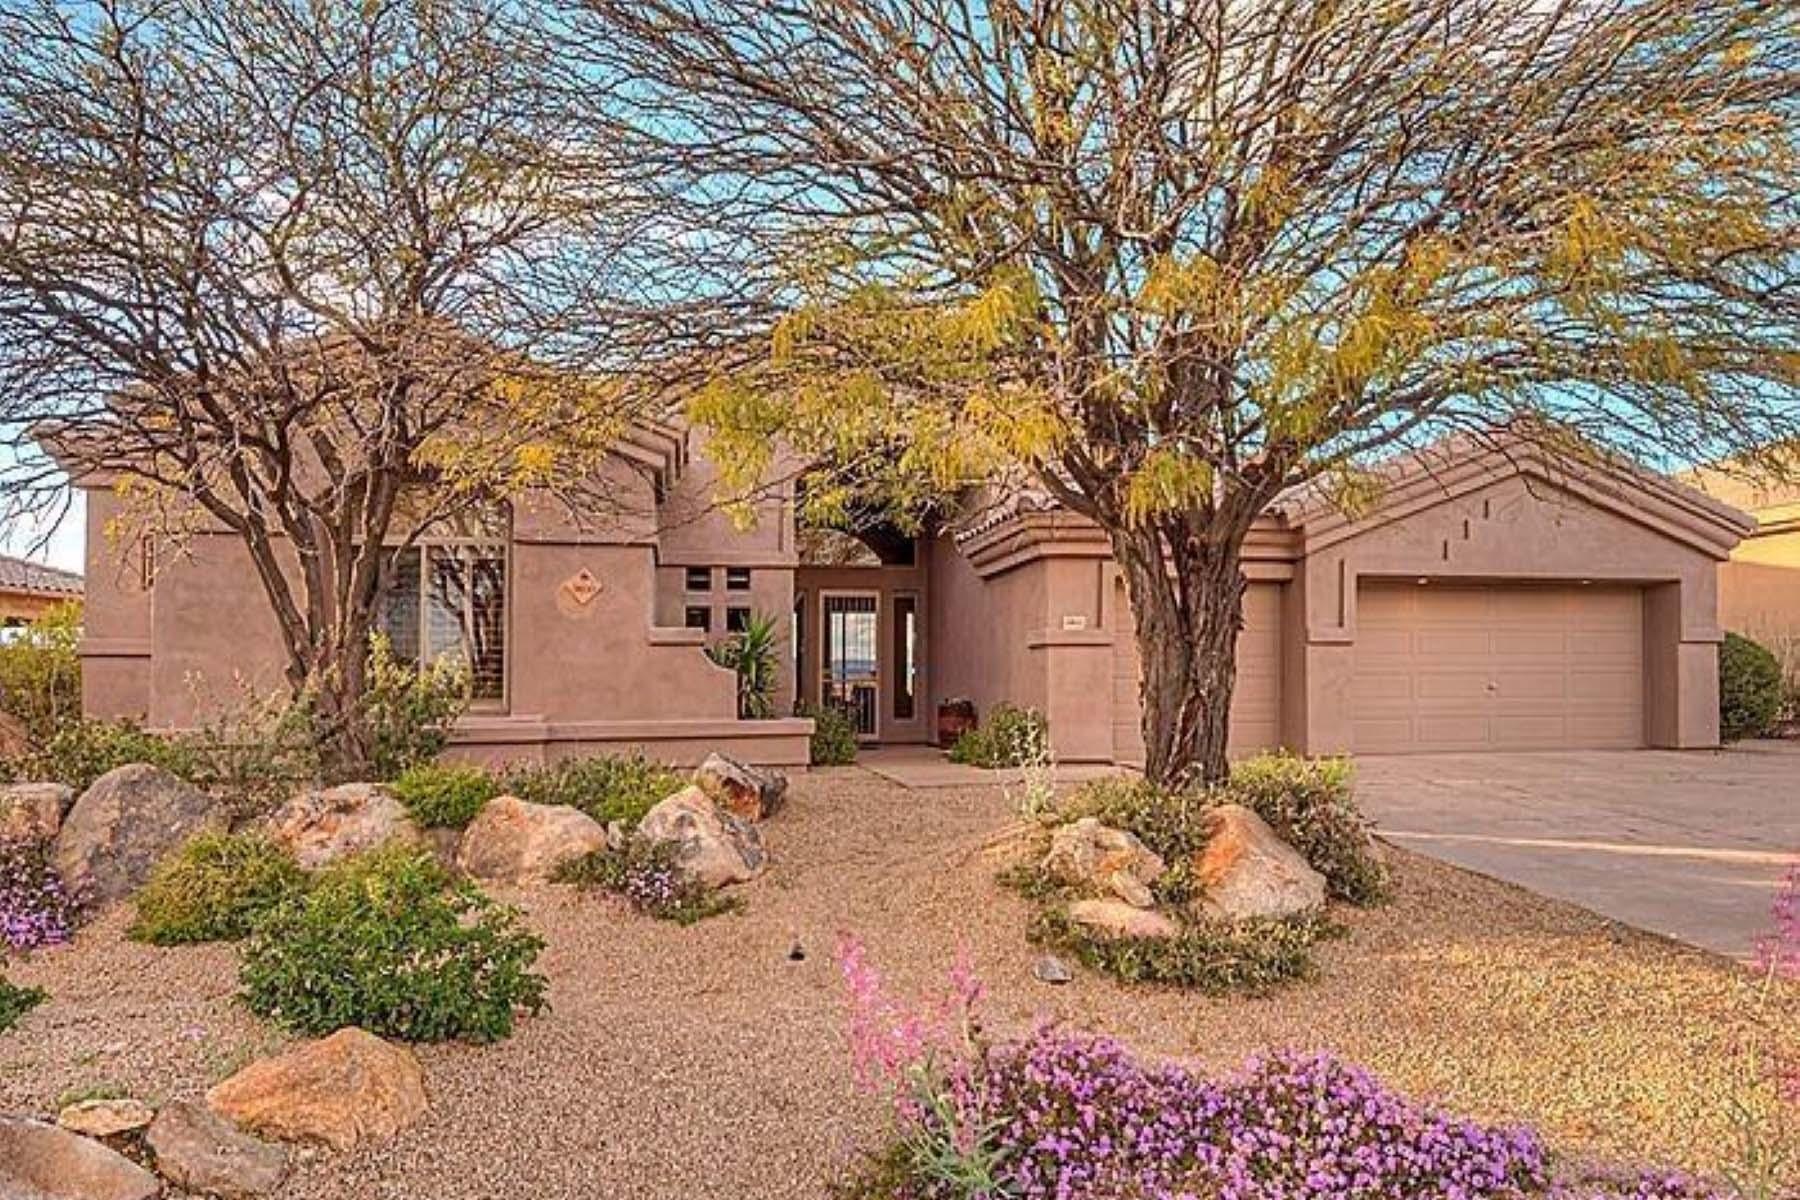 Casa Unifamiliar por un Venta en Beautiful home located on the golf course 16th green. 9800 E ROADRUNNER DR Scottsdale, Arizona 85262 Estados Unidos